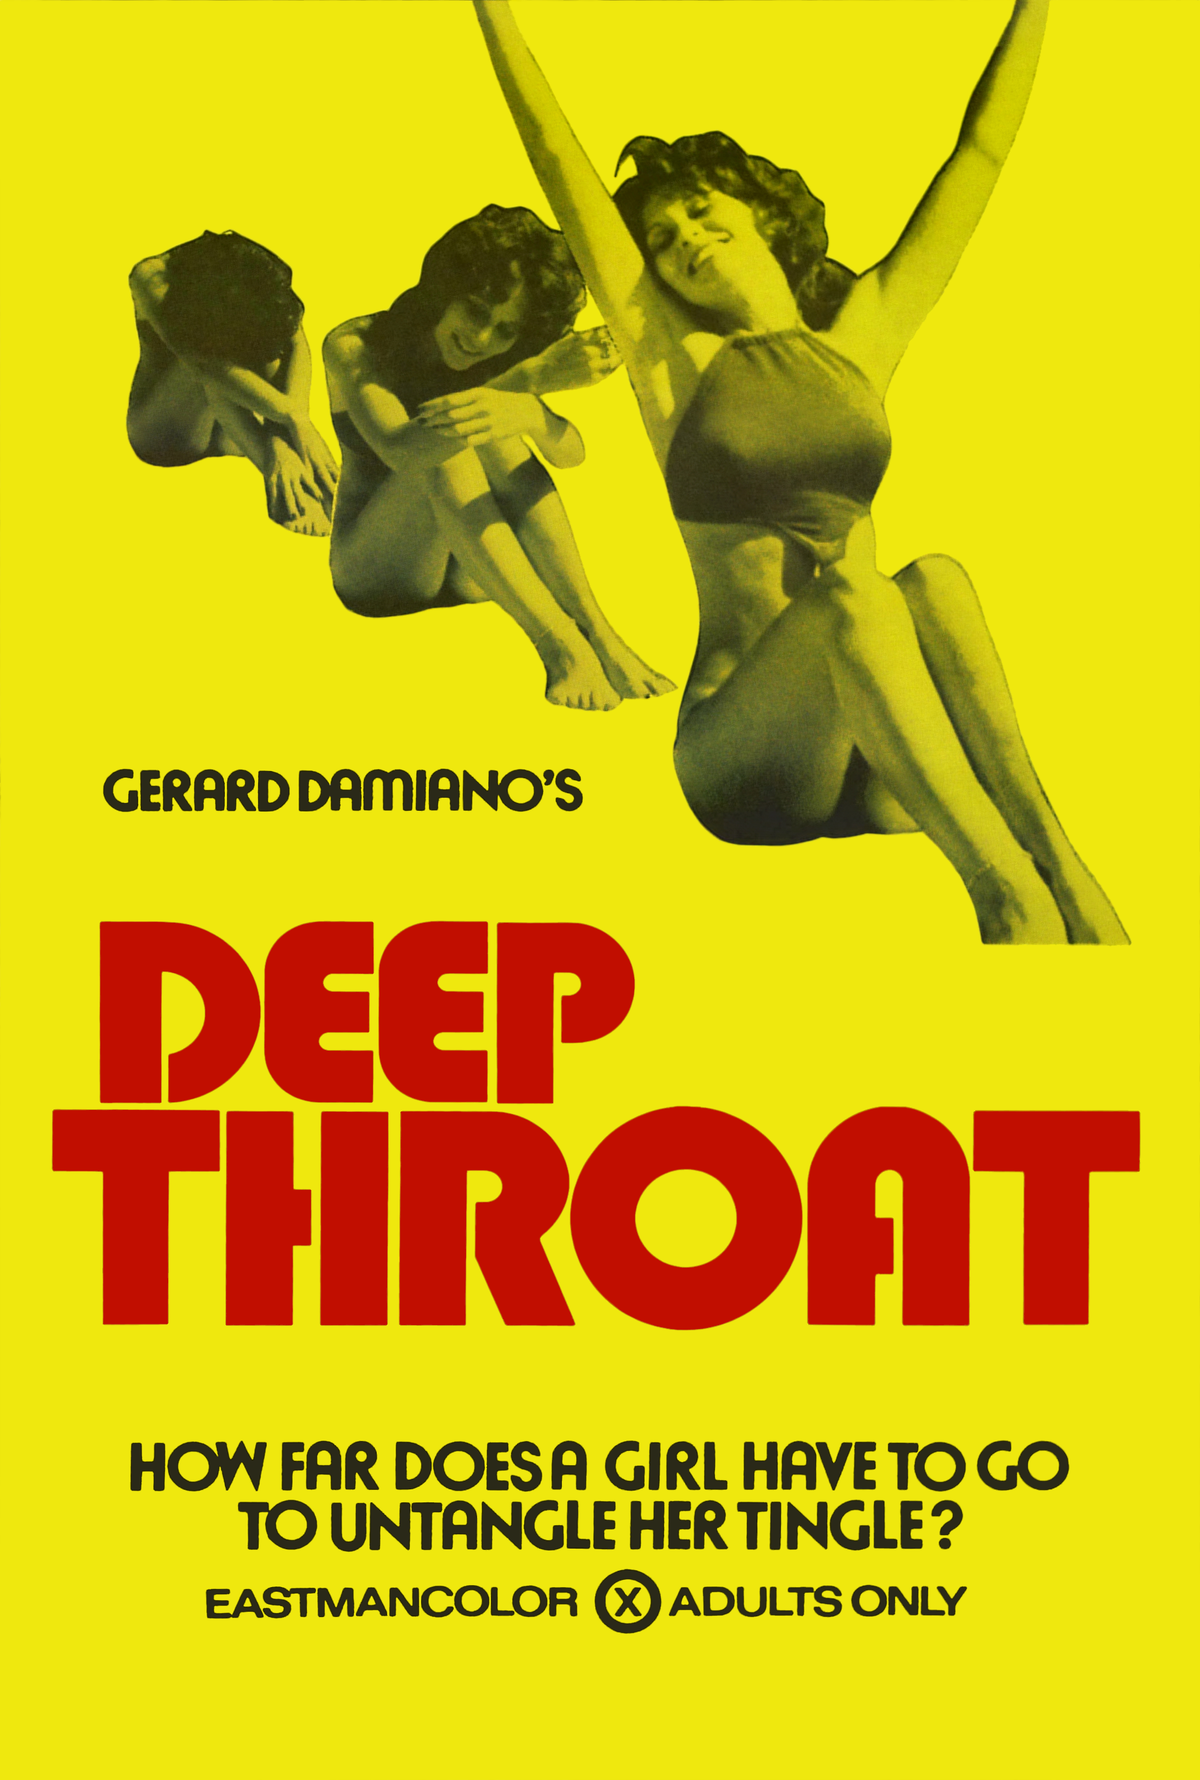 Deep throat ned film